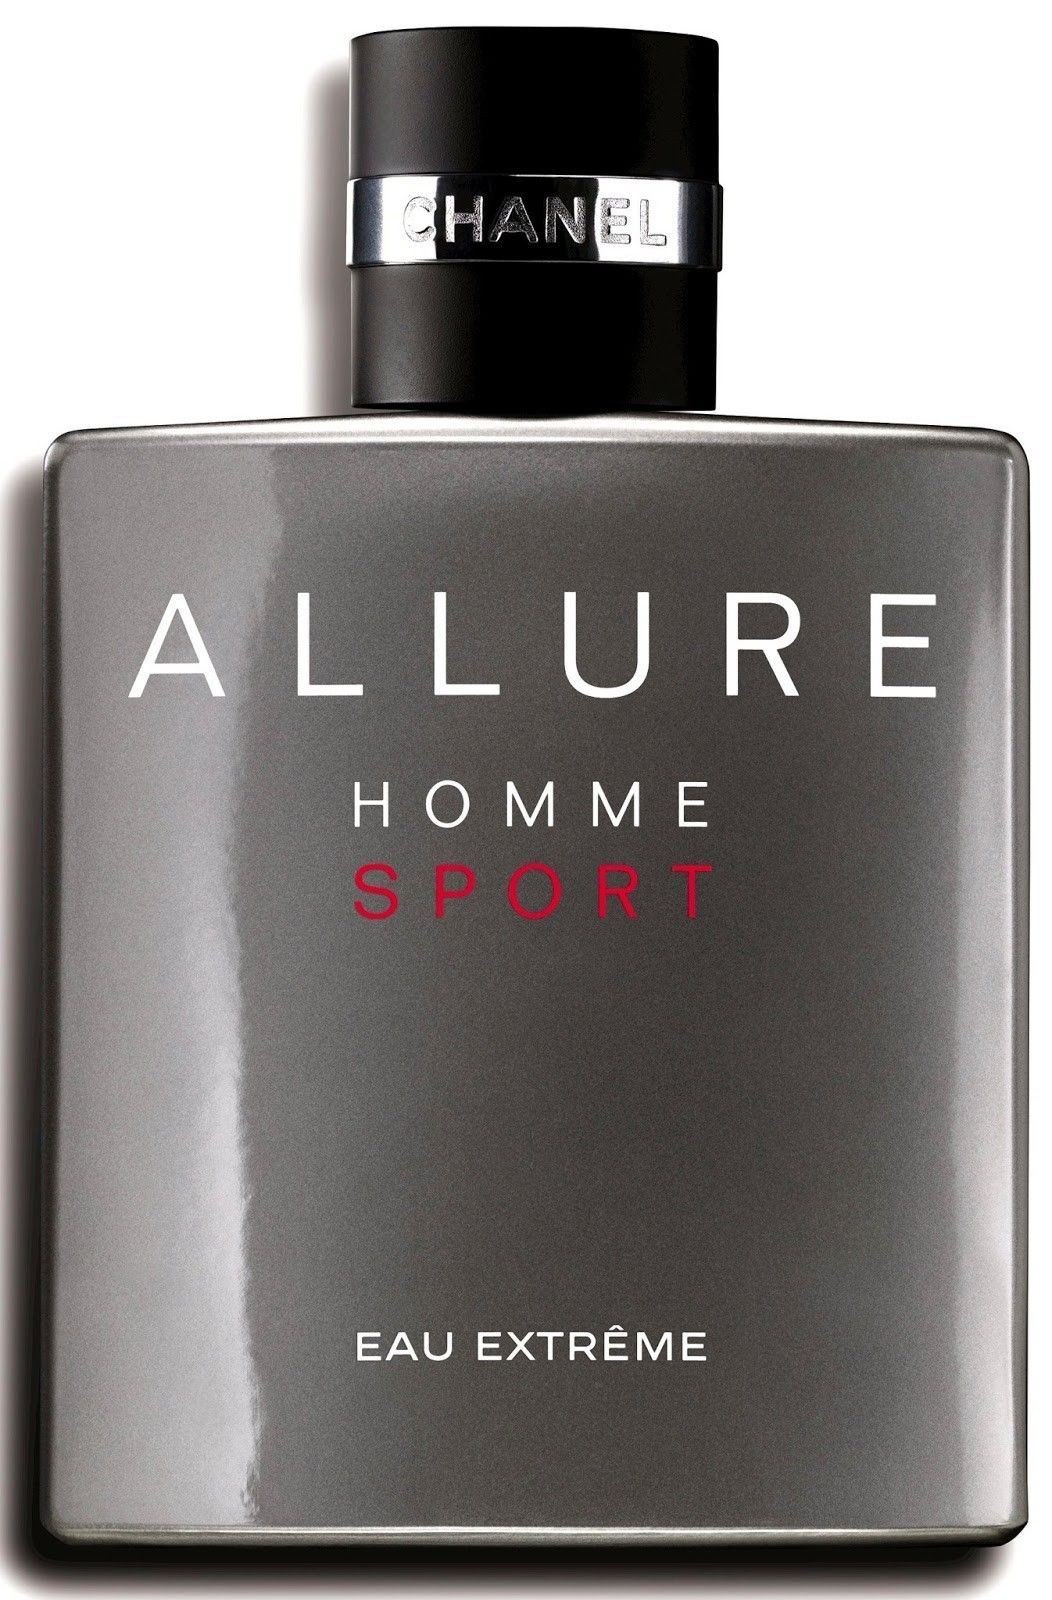 Allure Homme Sport Eau Extreme Chanel for men Perfume